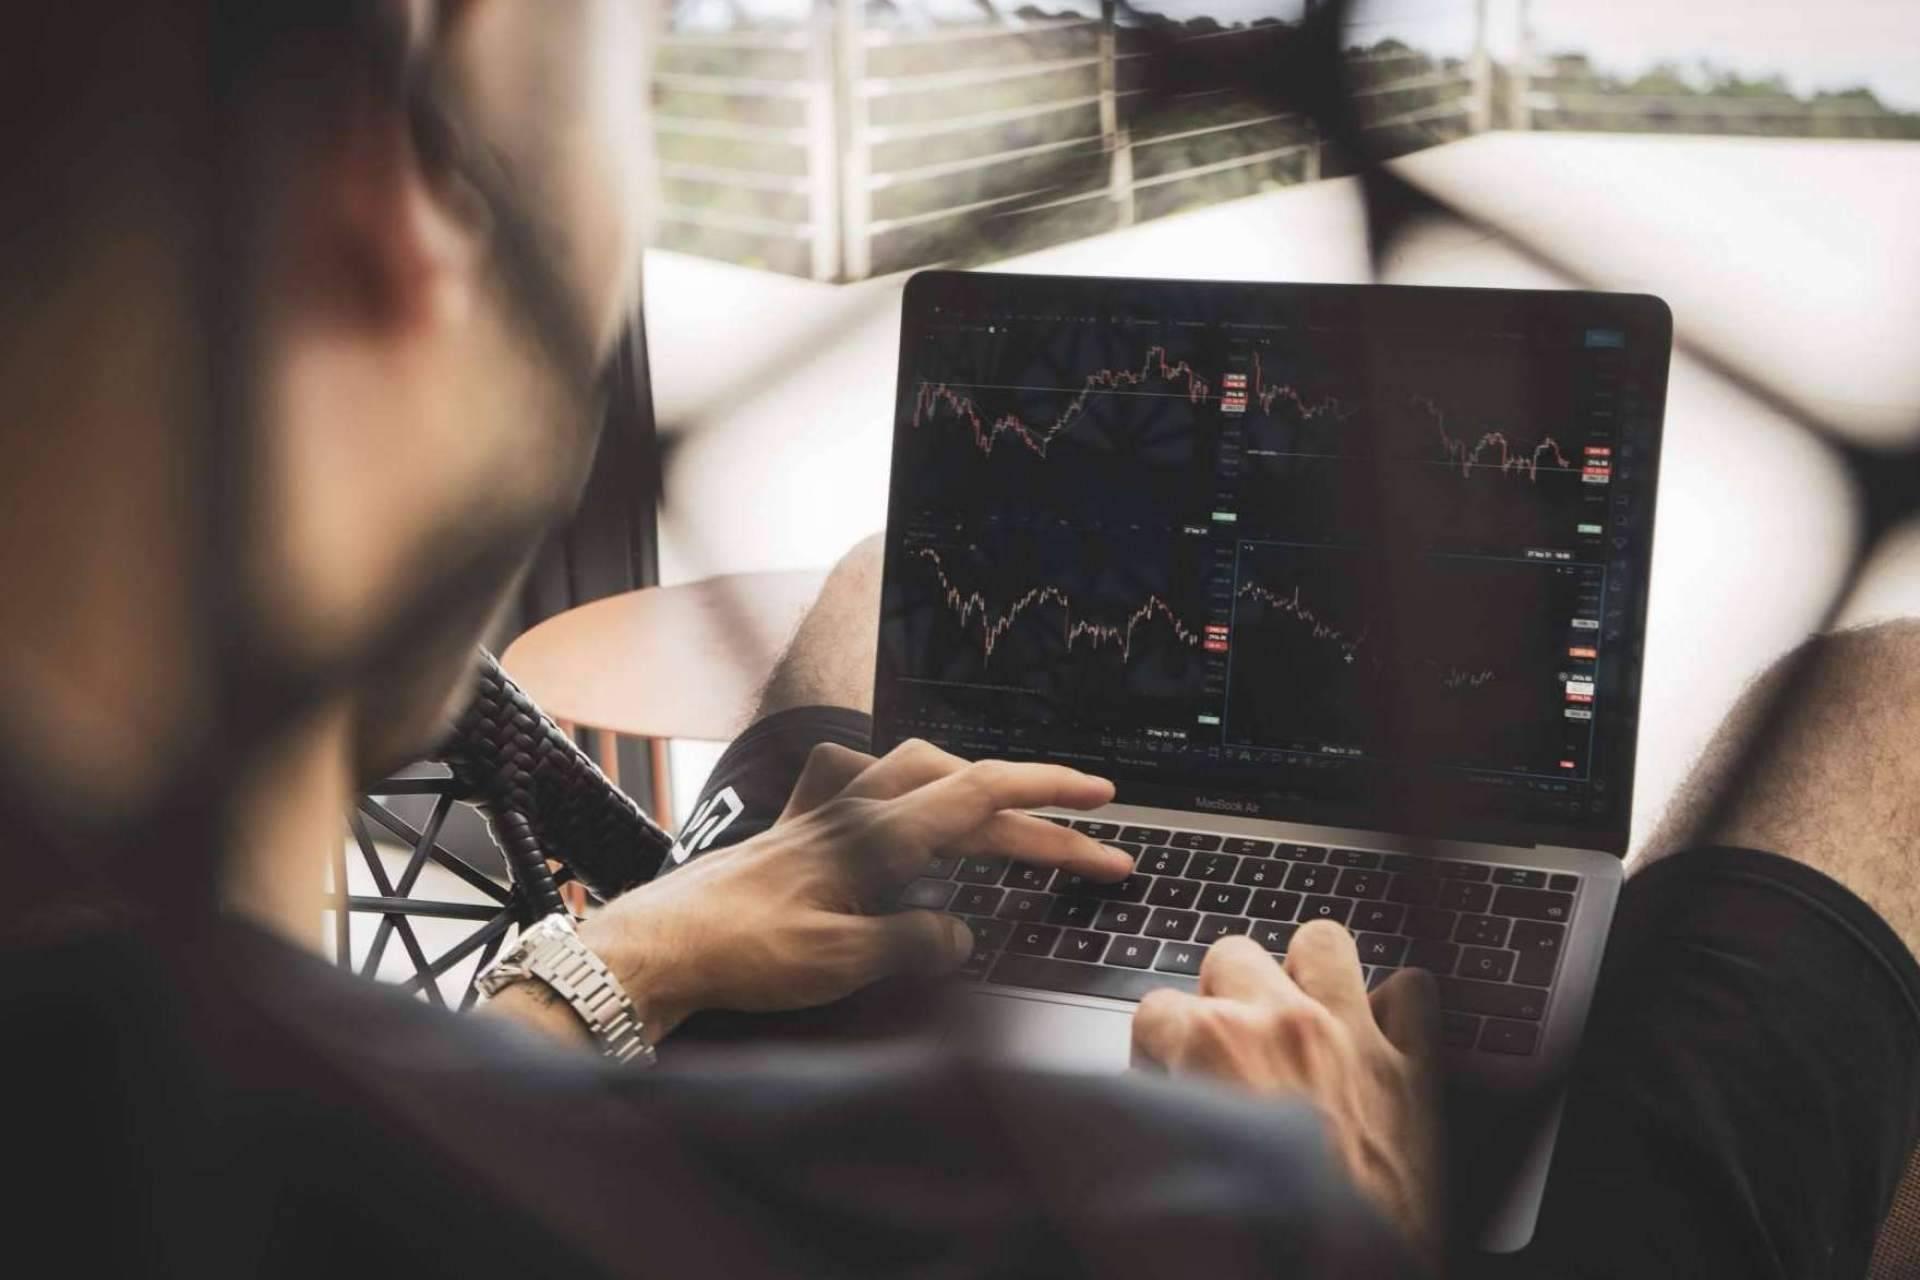 Conceptos fundamentales en criptomonedas para aprender a invertir, por Trading Lab